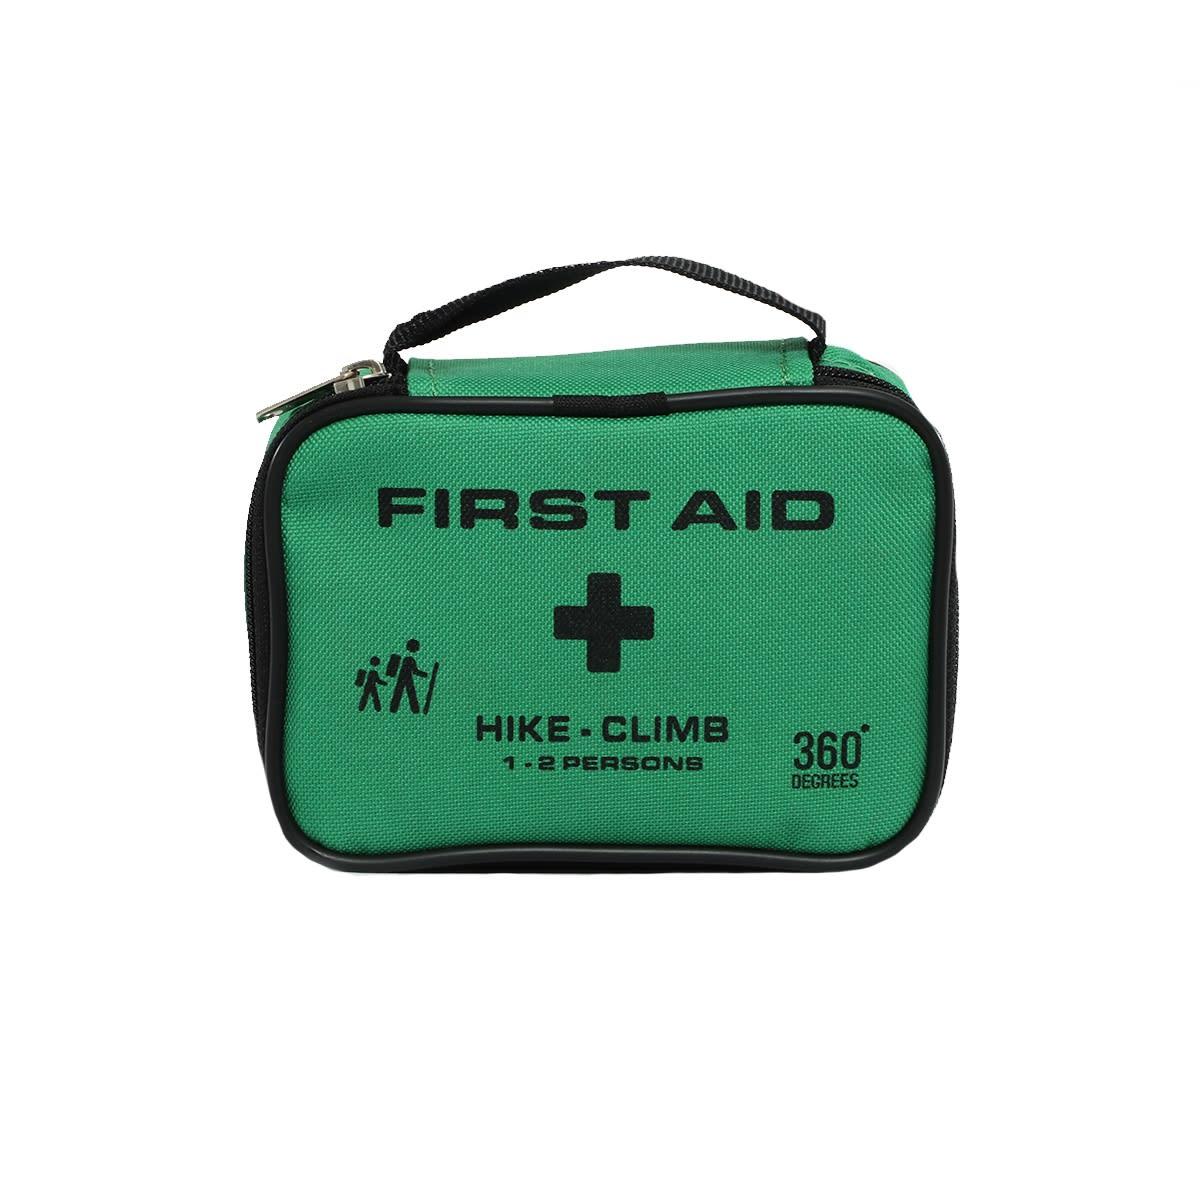 360 Degrees Climb/Hike First Aid Kit